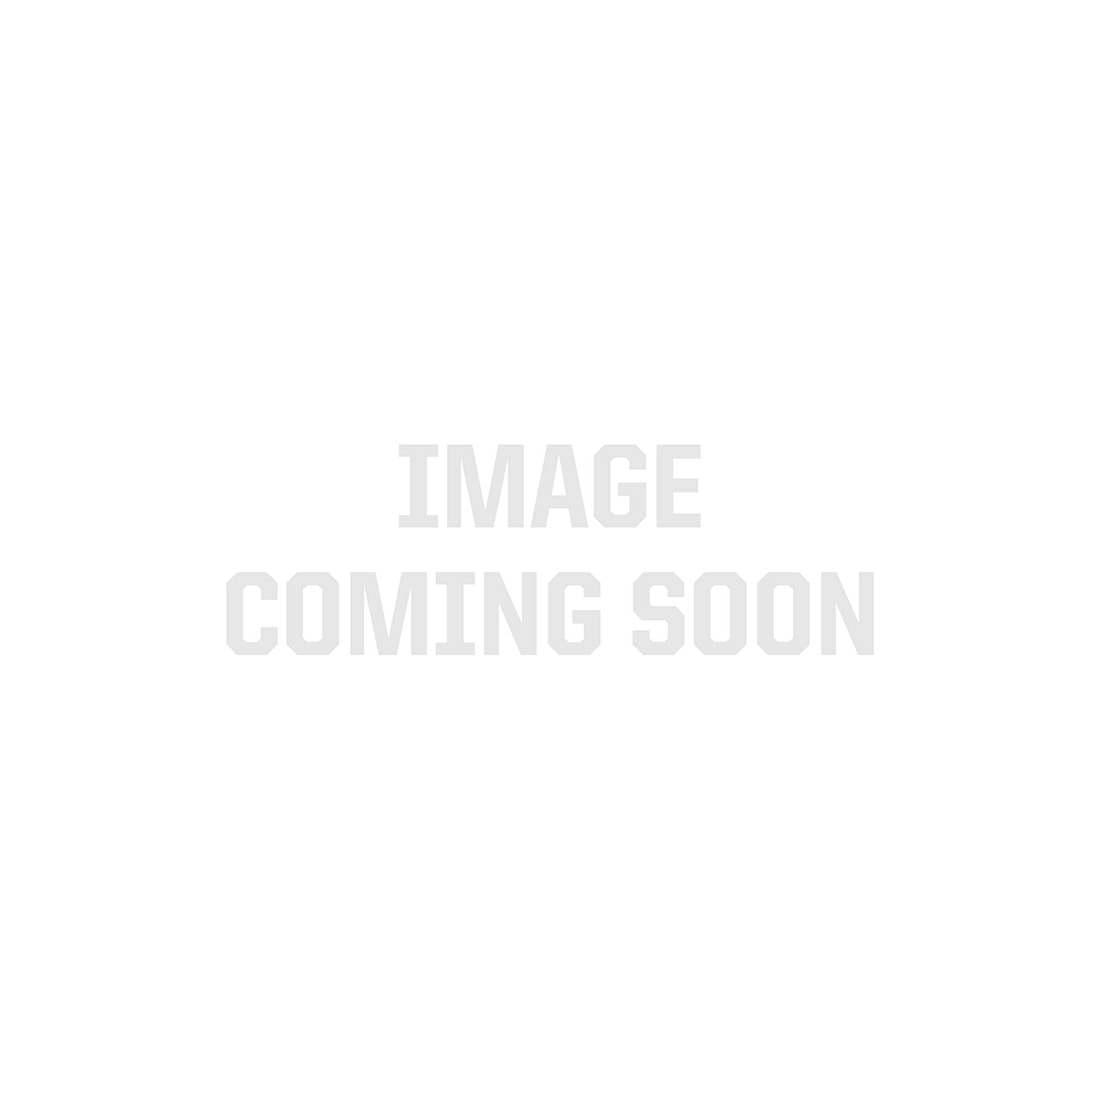 Amber 3528 LED Strip Light, 60/m, 8mm wide, Sample Kit